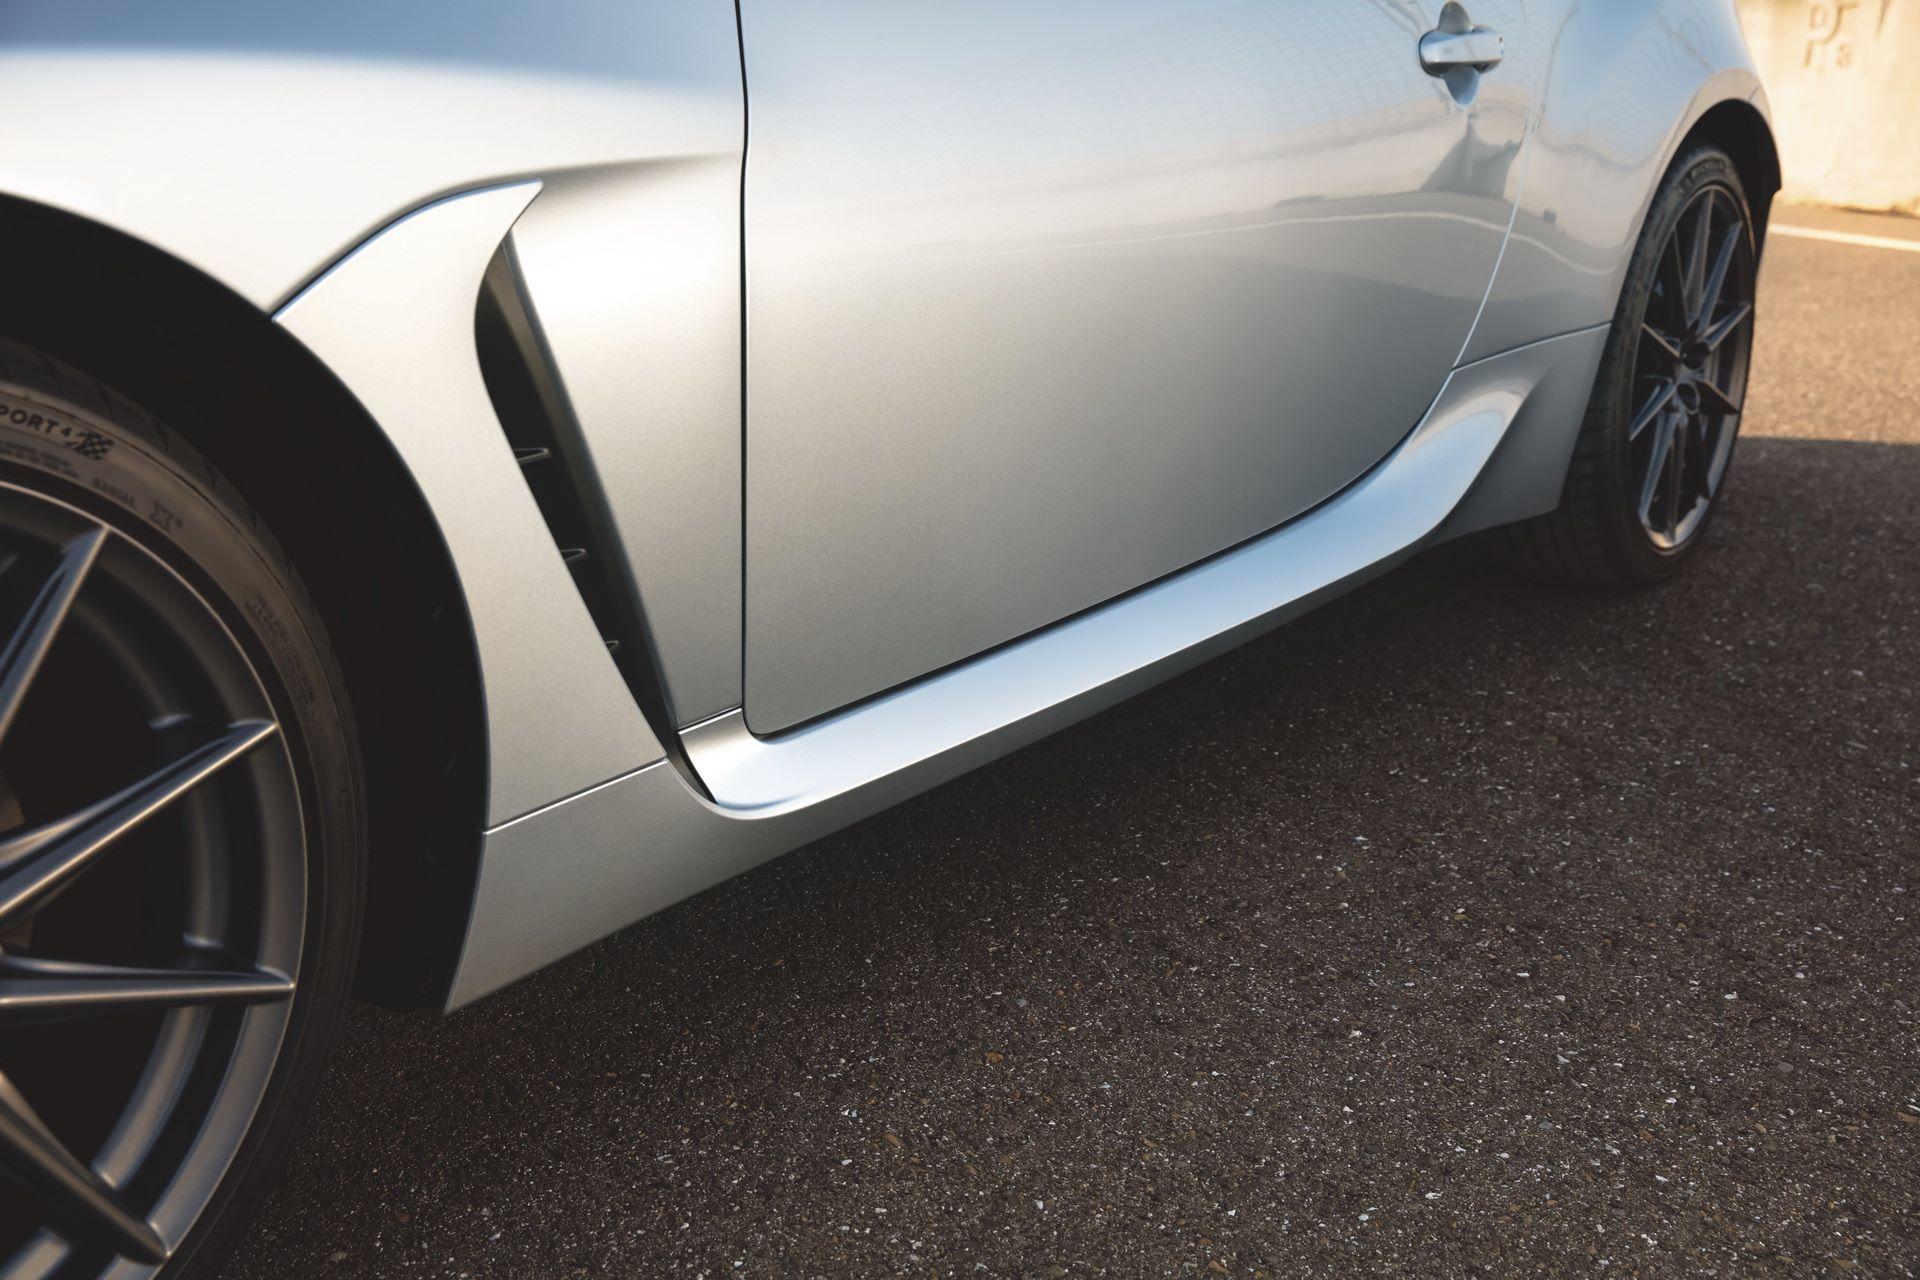 2022-Subaru-BRZ-07